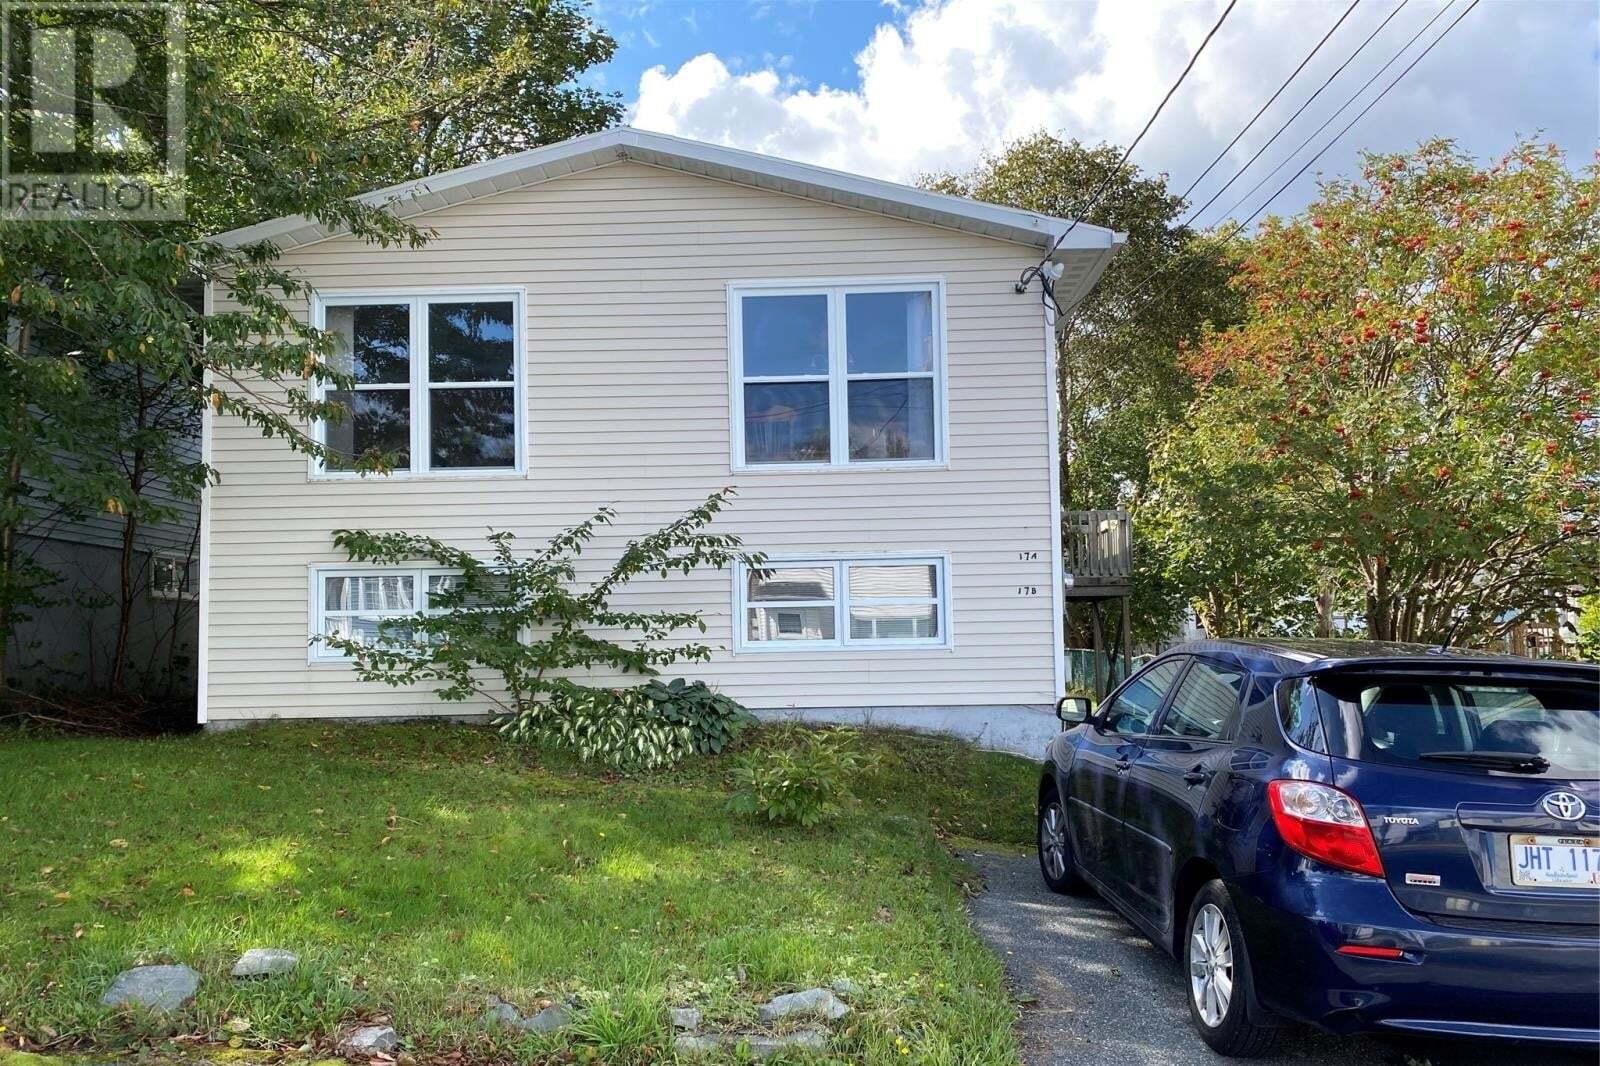 House for sale at 19 Malta St St. John's Newfoundland - MLS: 1221752